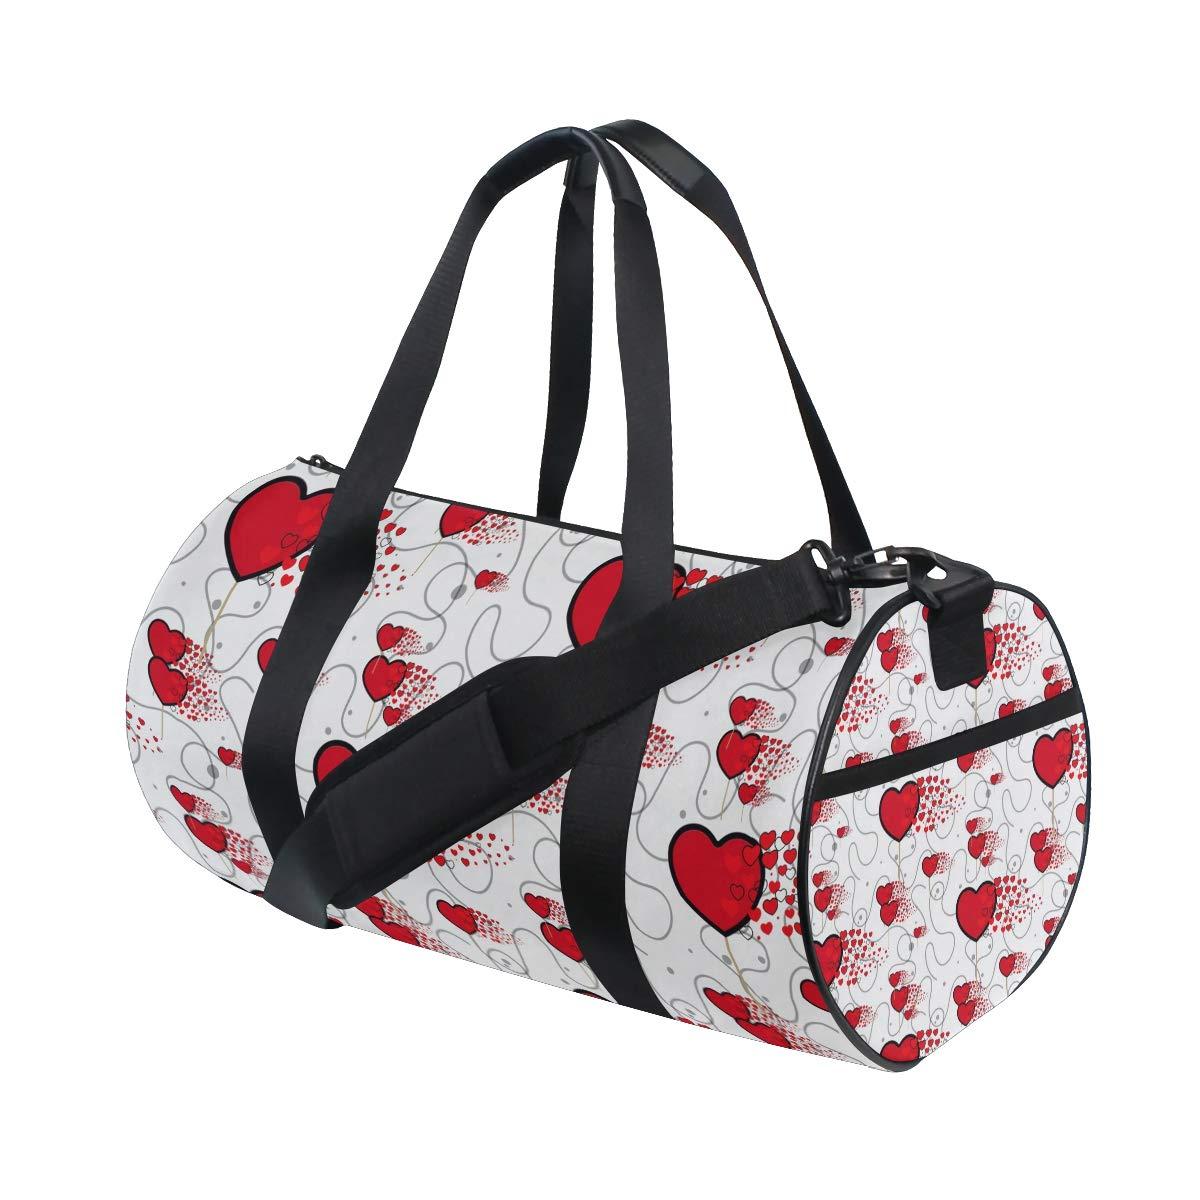 AHOMY Love Heart Sports Gym Bag Travel Overnight Duffel Bag for Men and Women